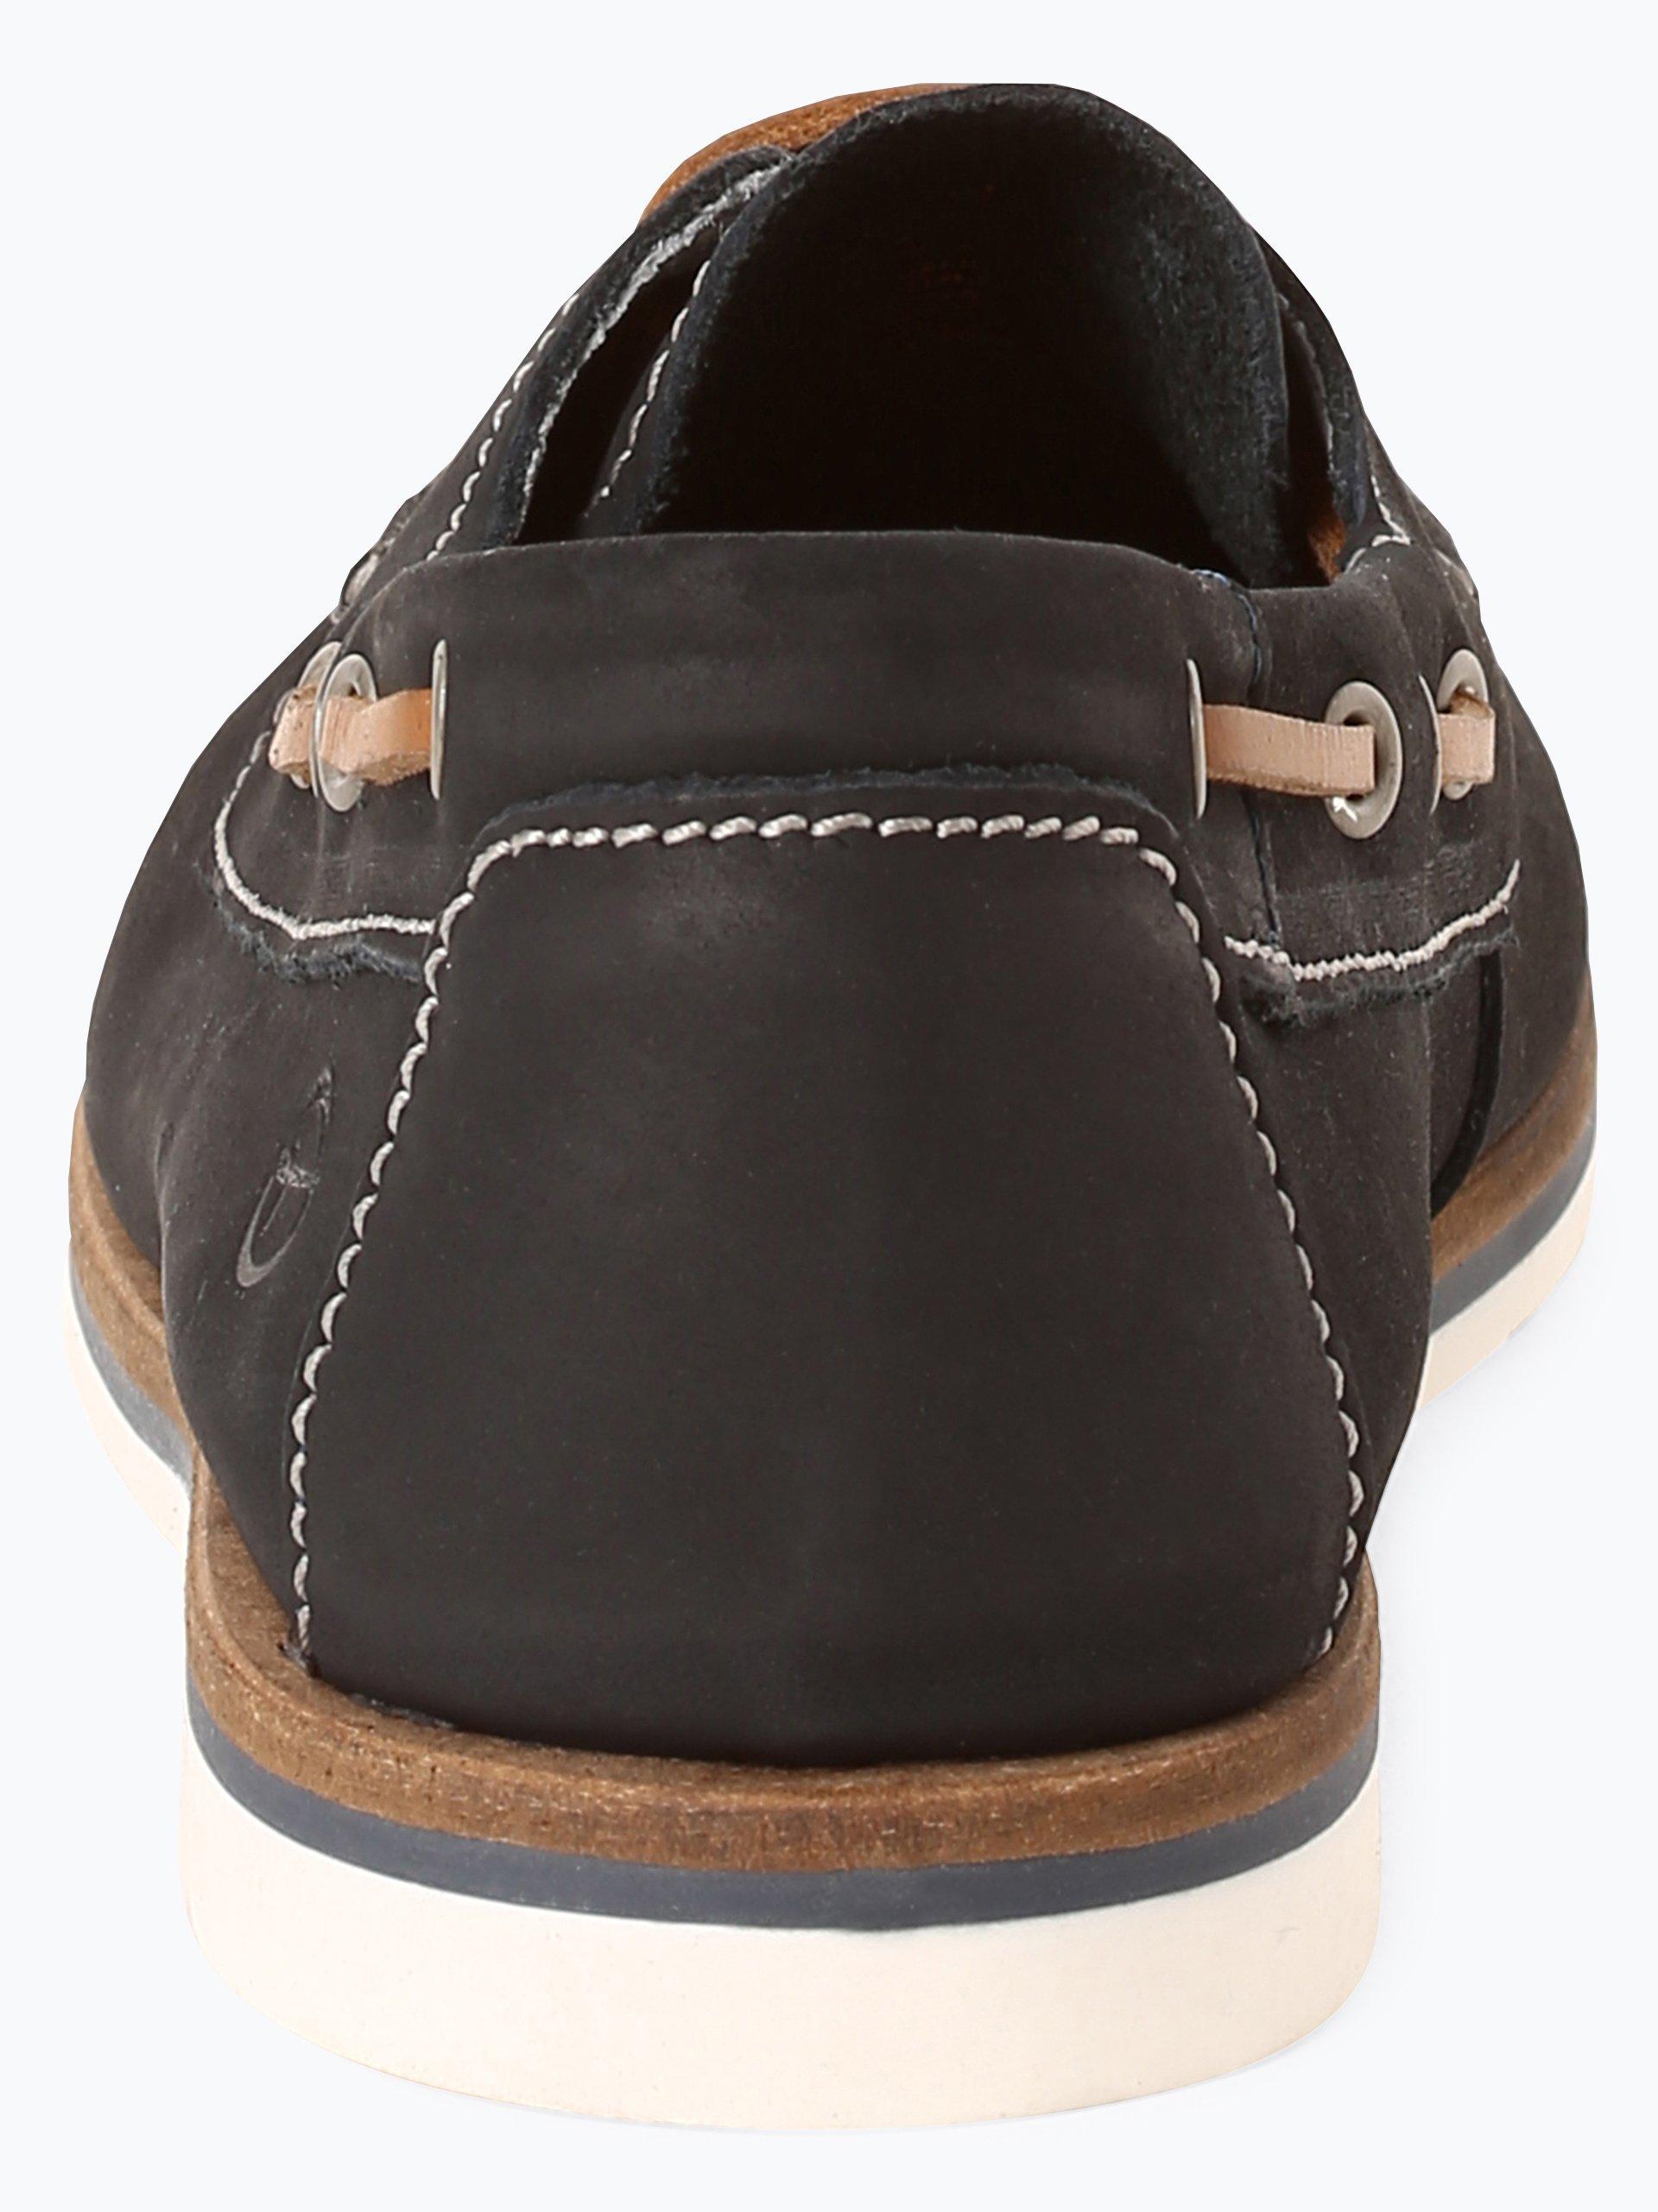 Tamaris Damen Slipper aus Leder